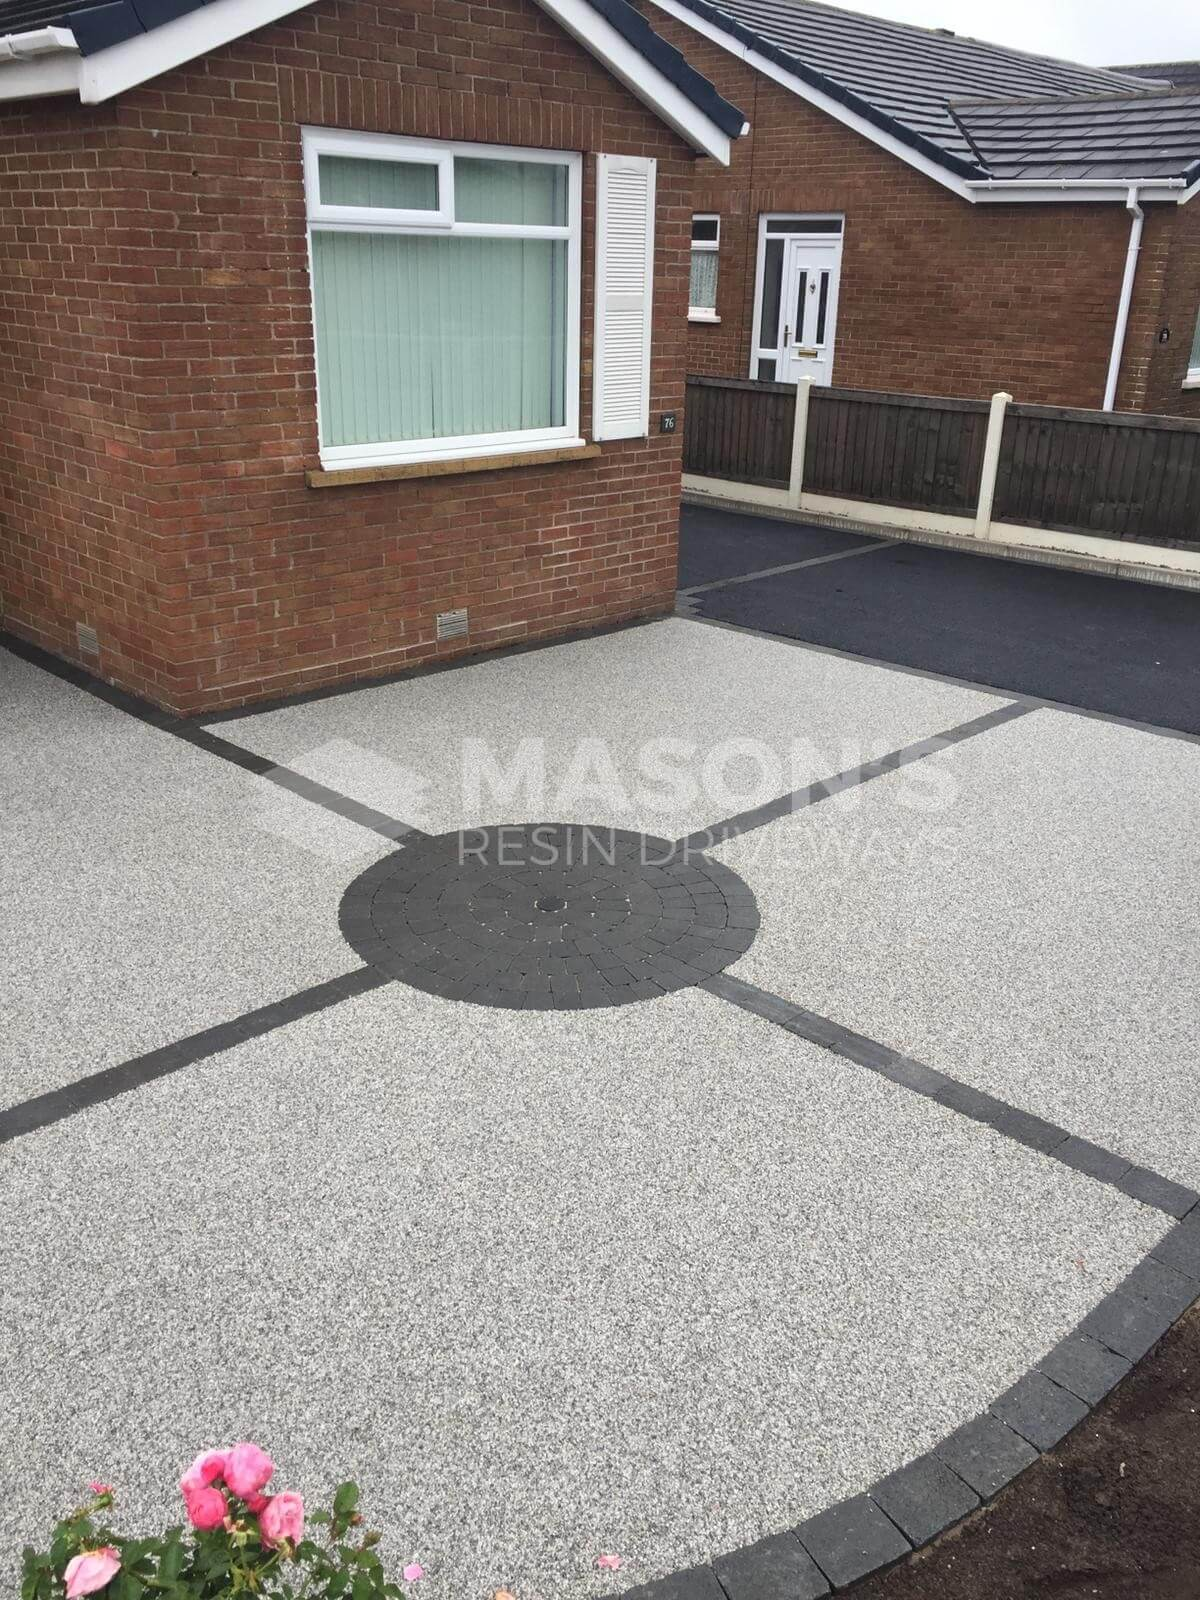 Silver Quartz Resin Tarmac Driveway in Preston, Lancashire